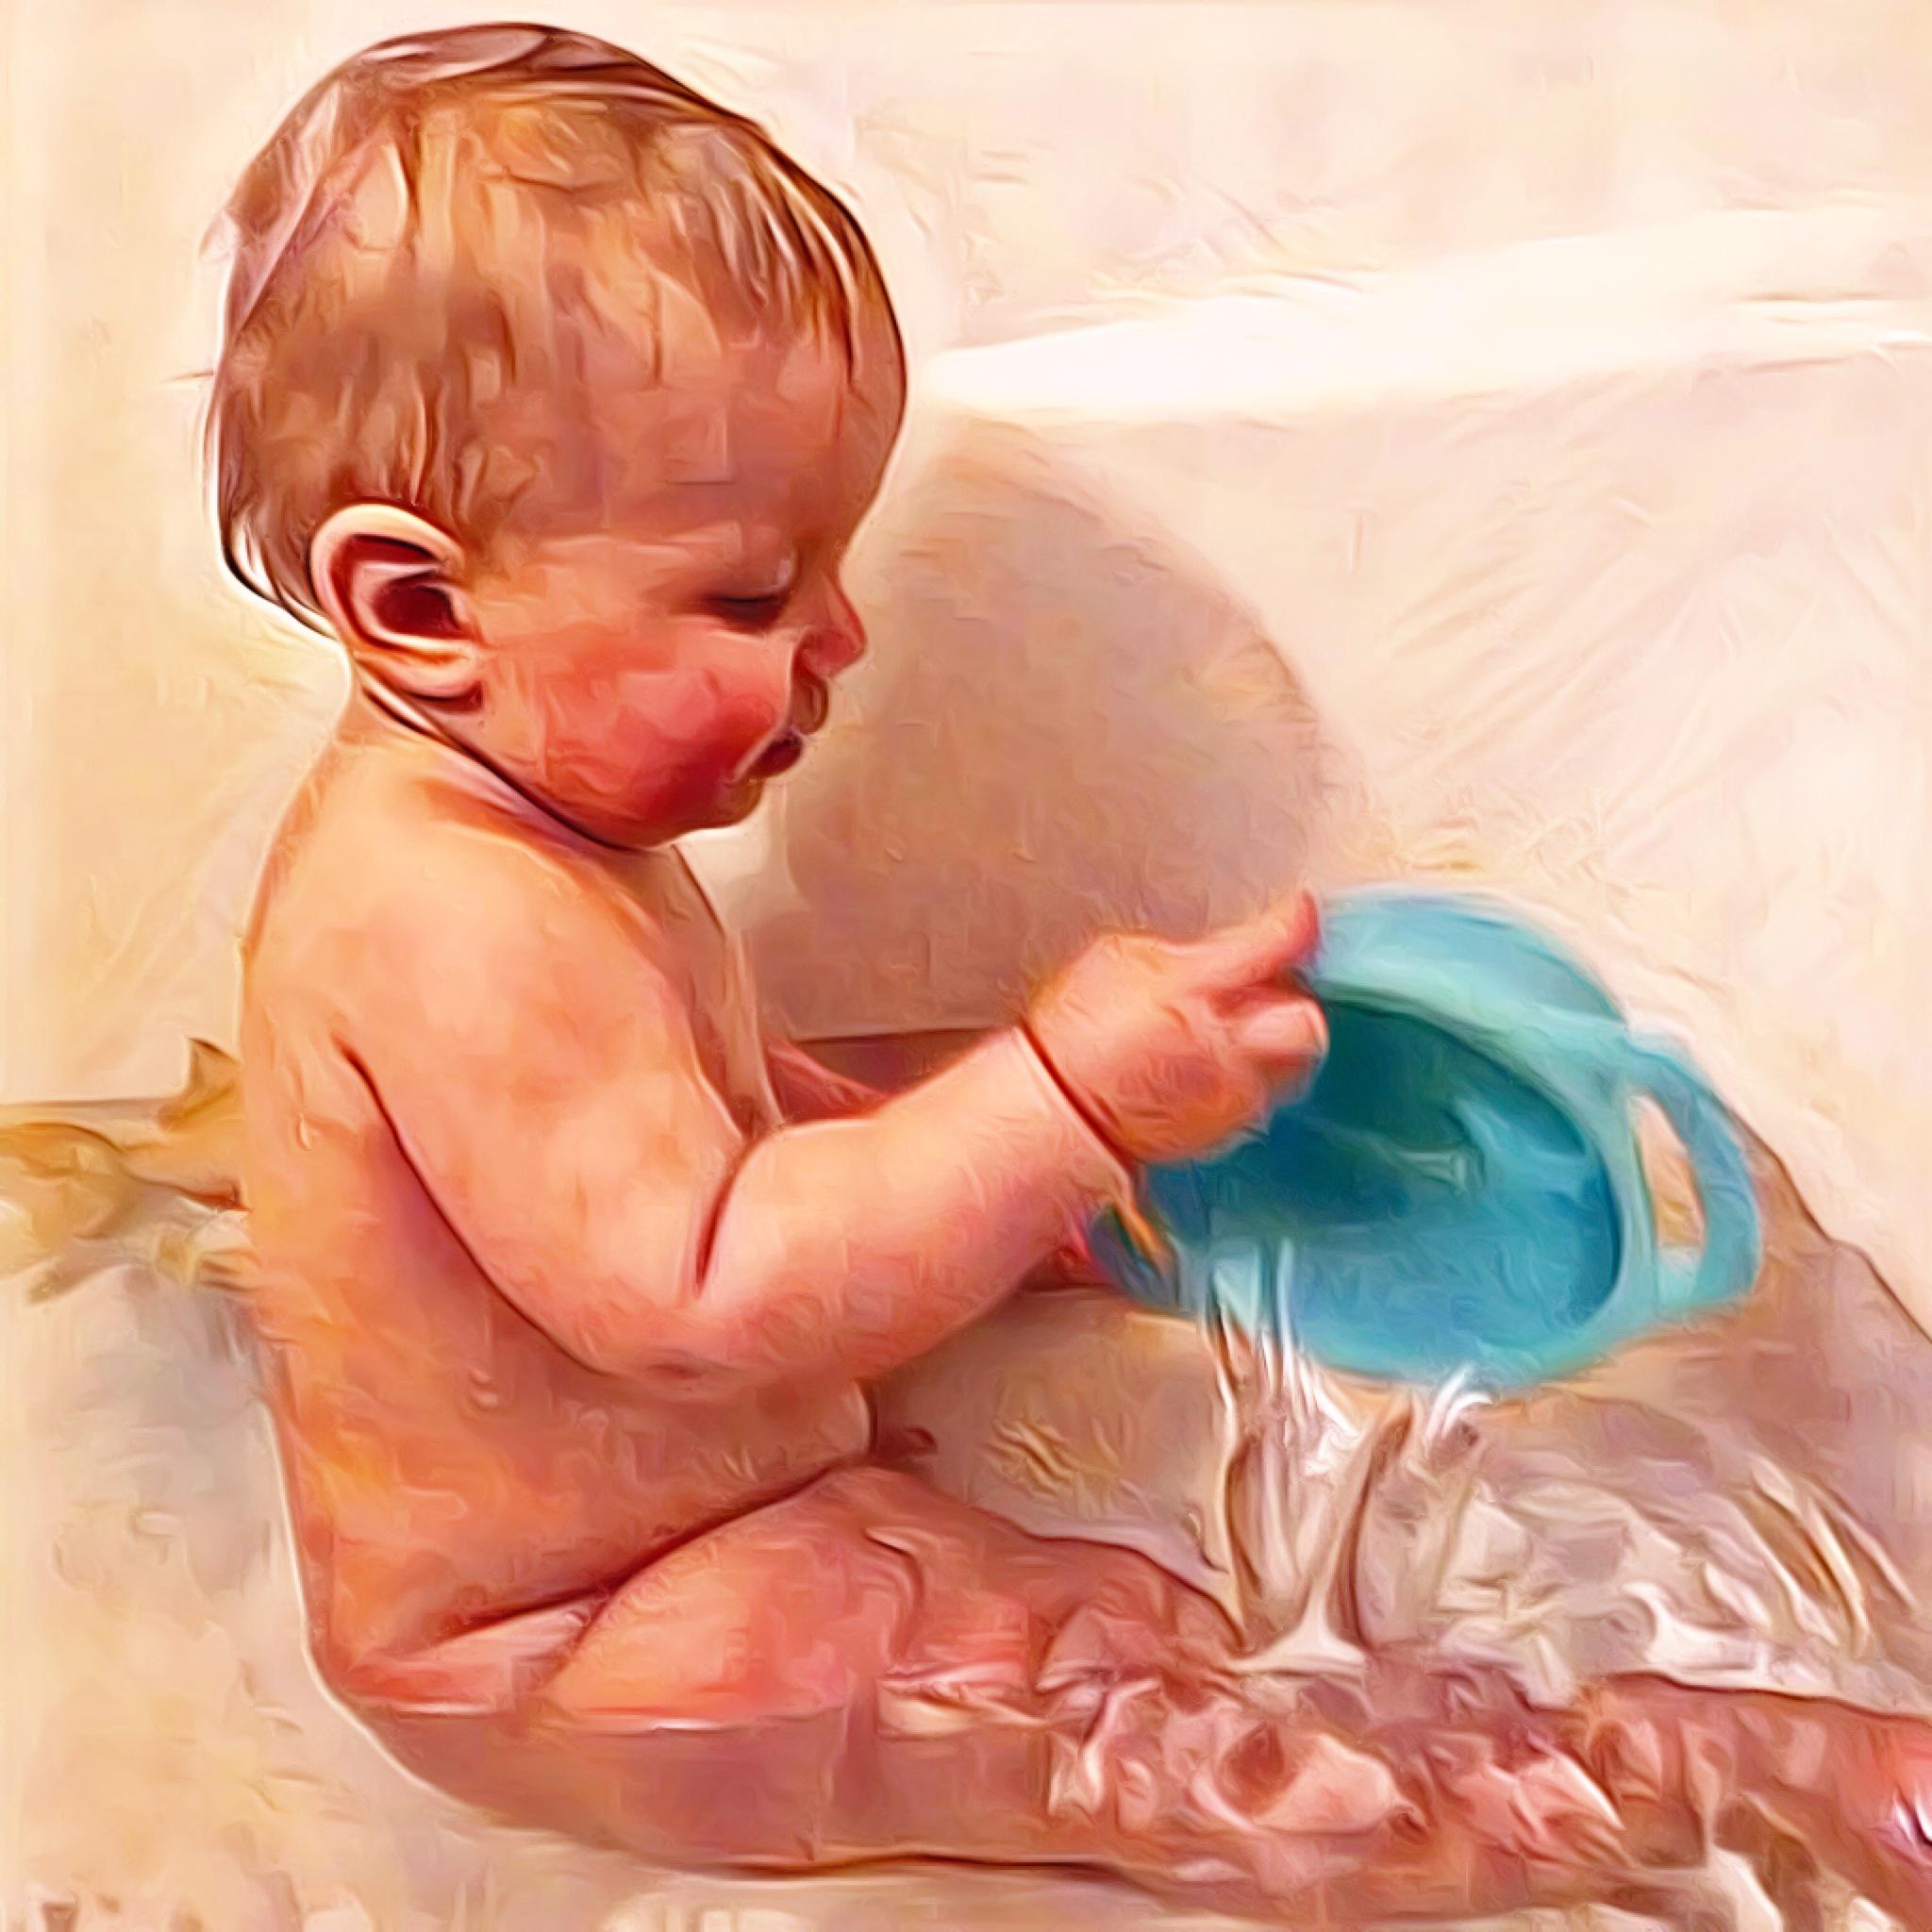 Frankie's Bath-1 by Michael Brunsfeld